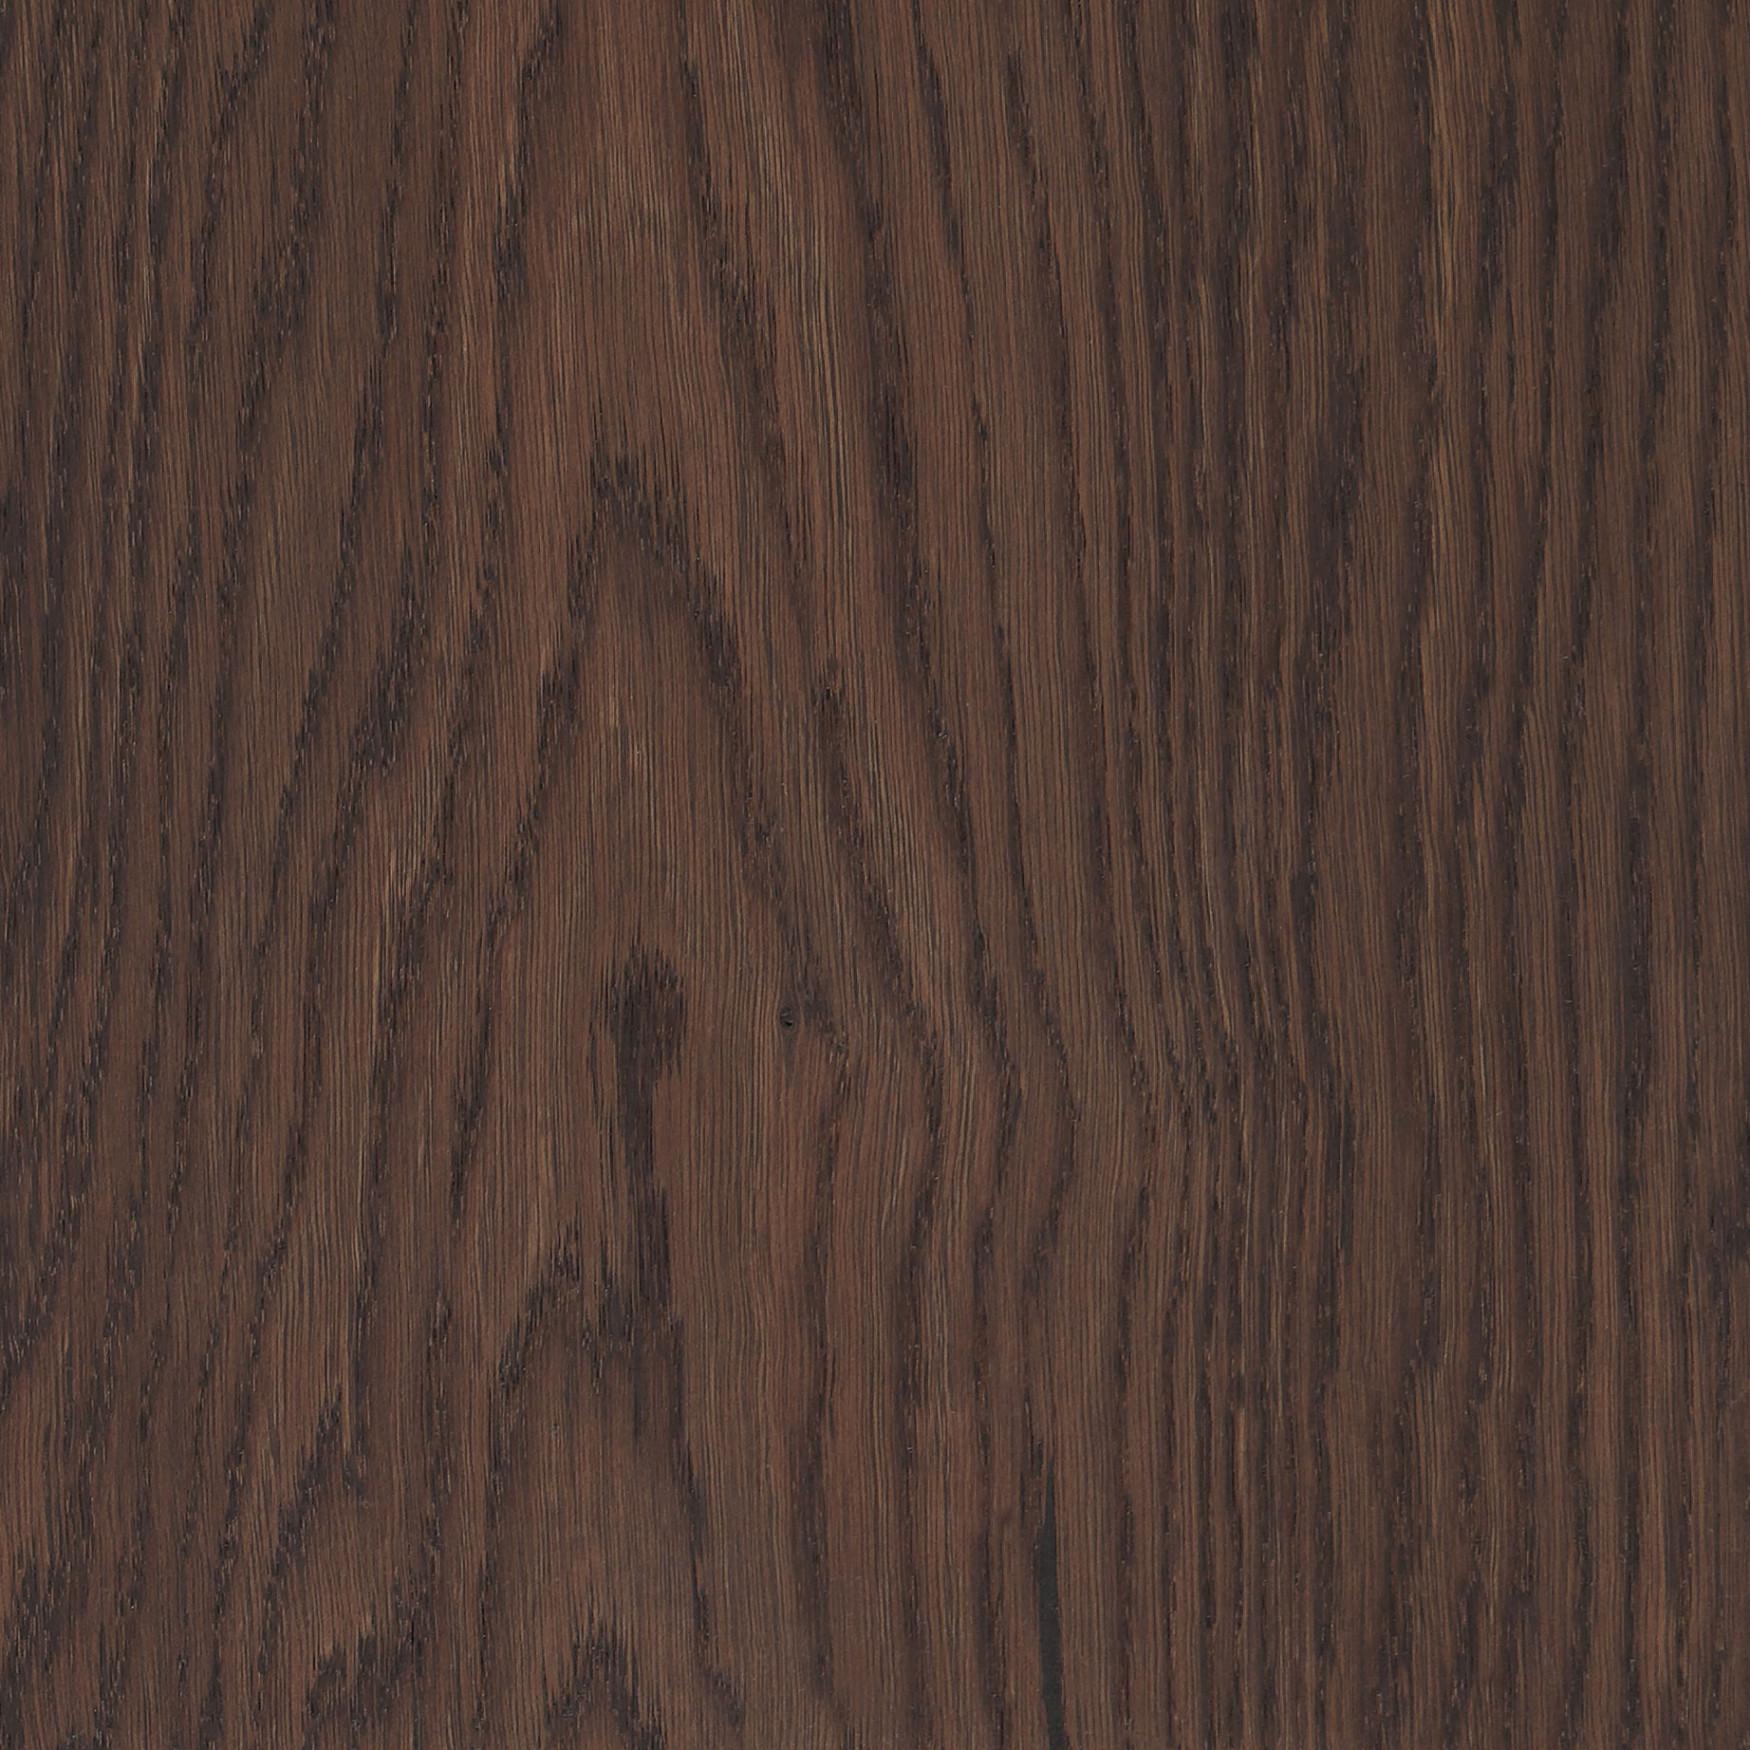 Element7-wide-plank-samples-Washed-Fired-OakAJ_562_544_FiredOak-v2